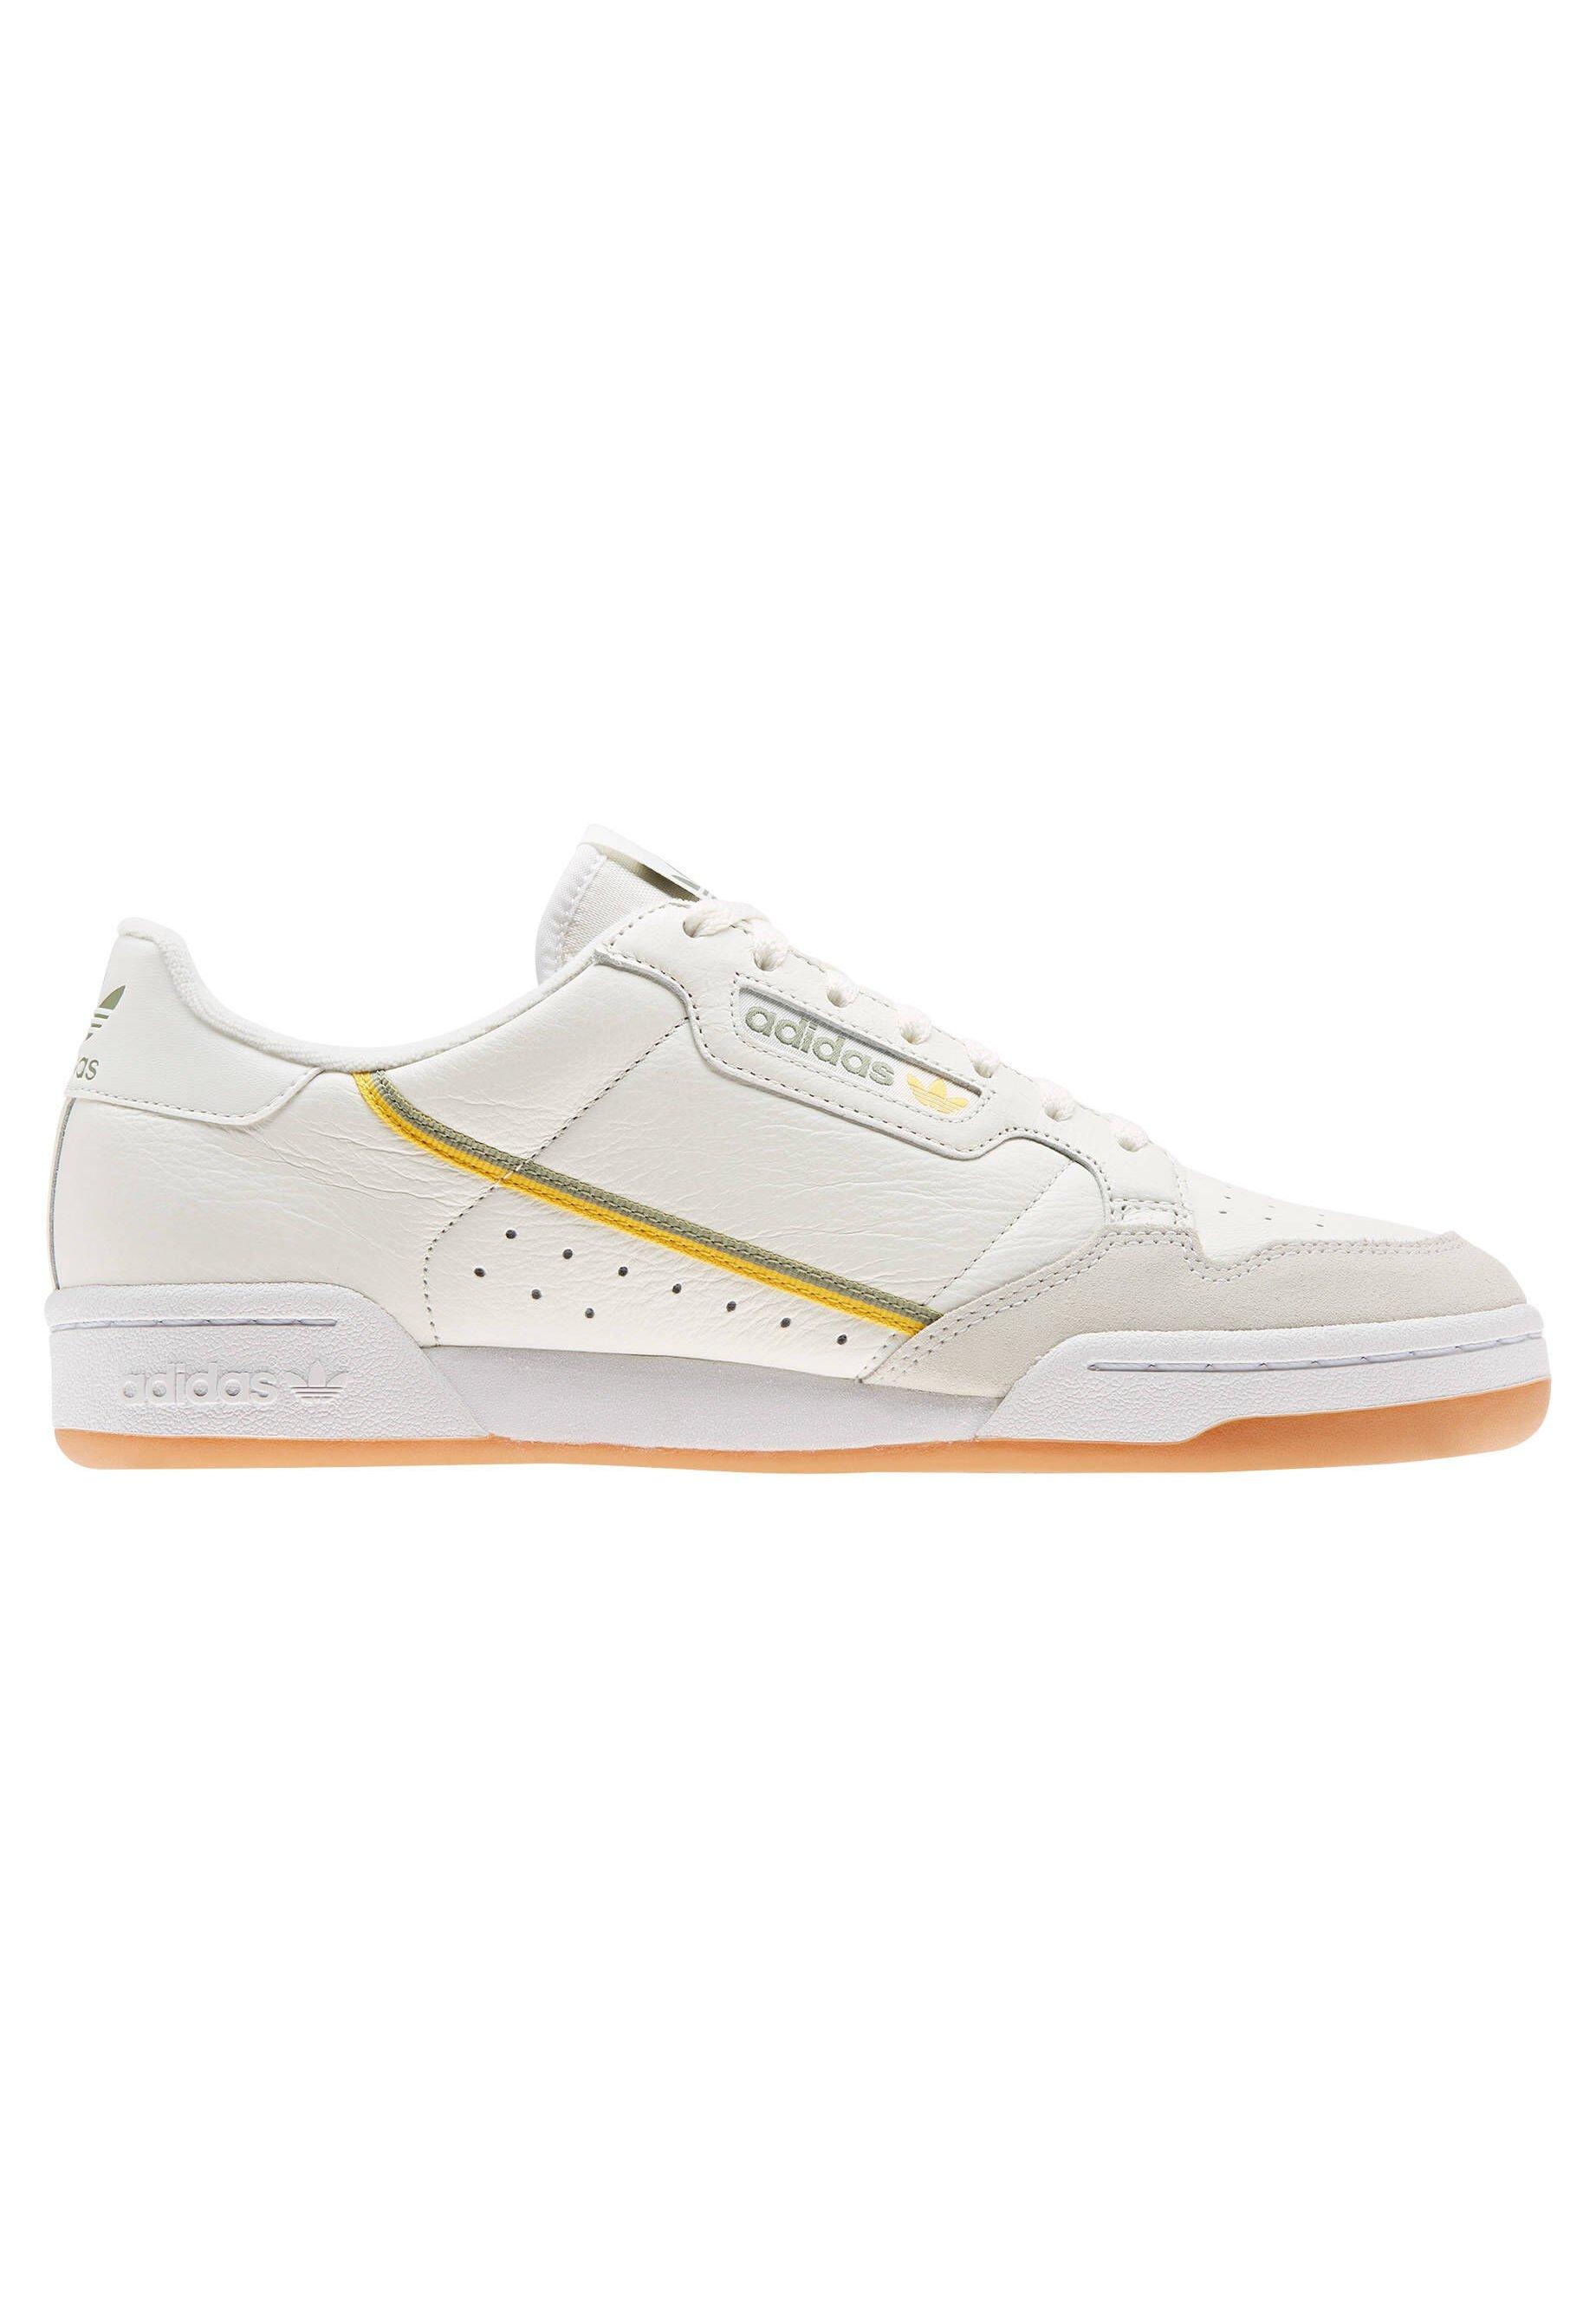 "Geringster Preis adidas Originals ADIDAS ORIGINALS SNEAKER ""CONTINENTAL 80"" - Sneaker low - white | Damenbekleidung 2020"